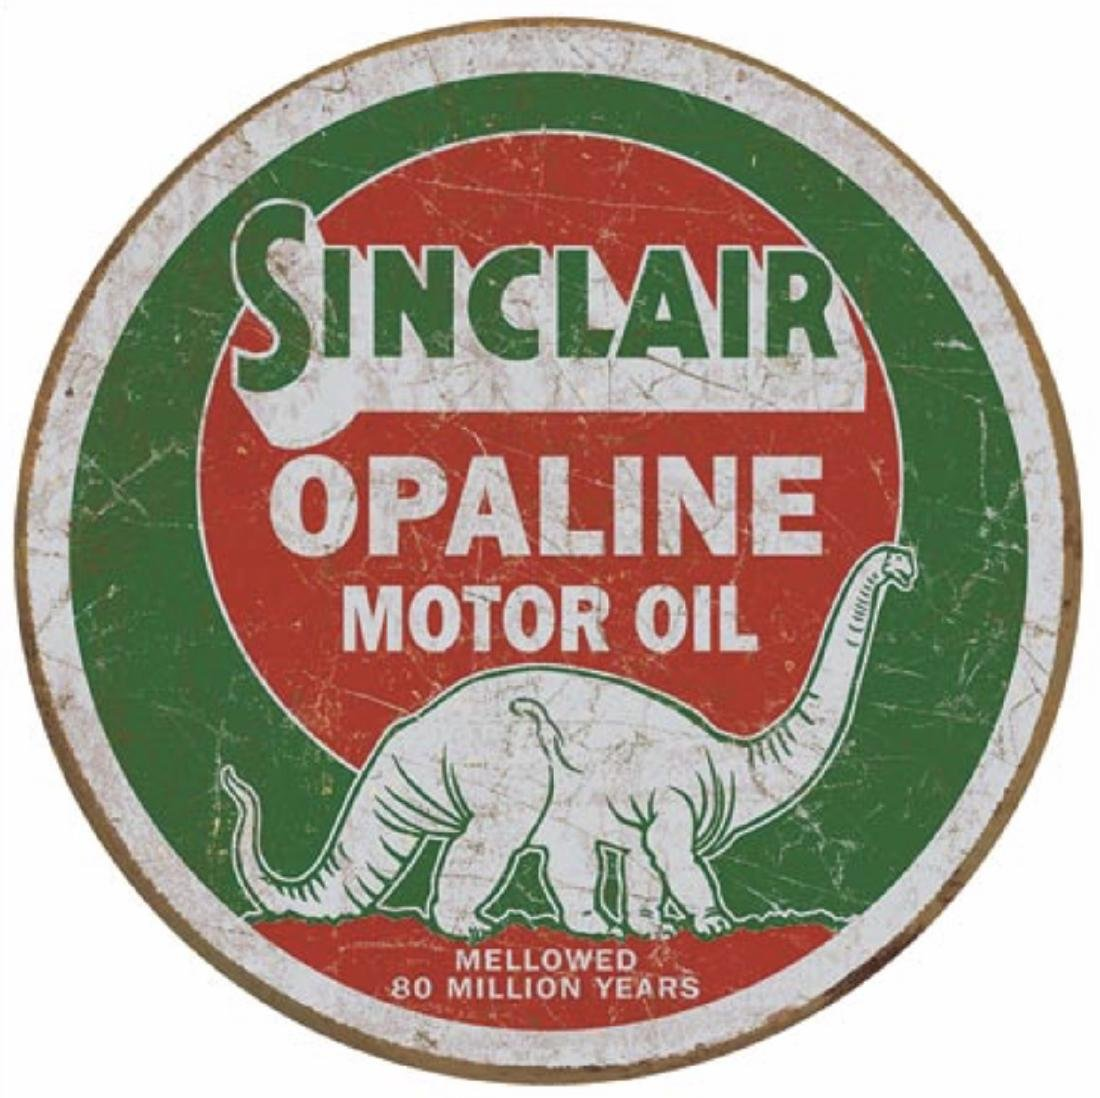 SINCLAIR Opaline Motor Oil Nostalgic Metal Sign